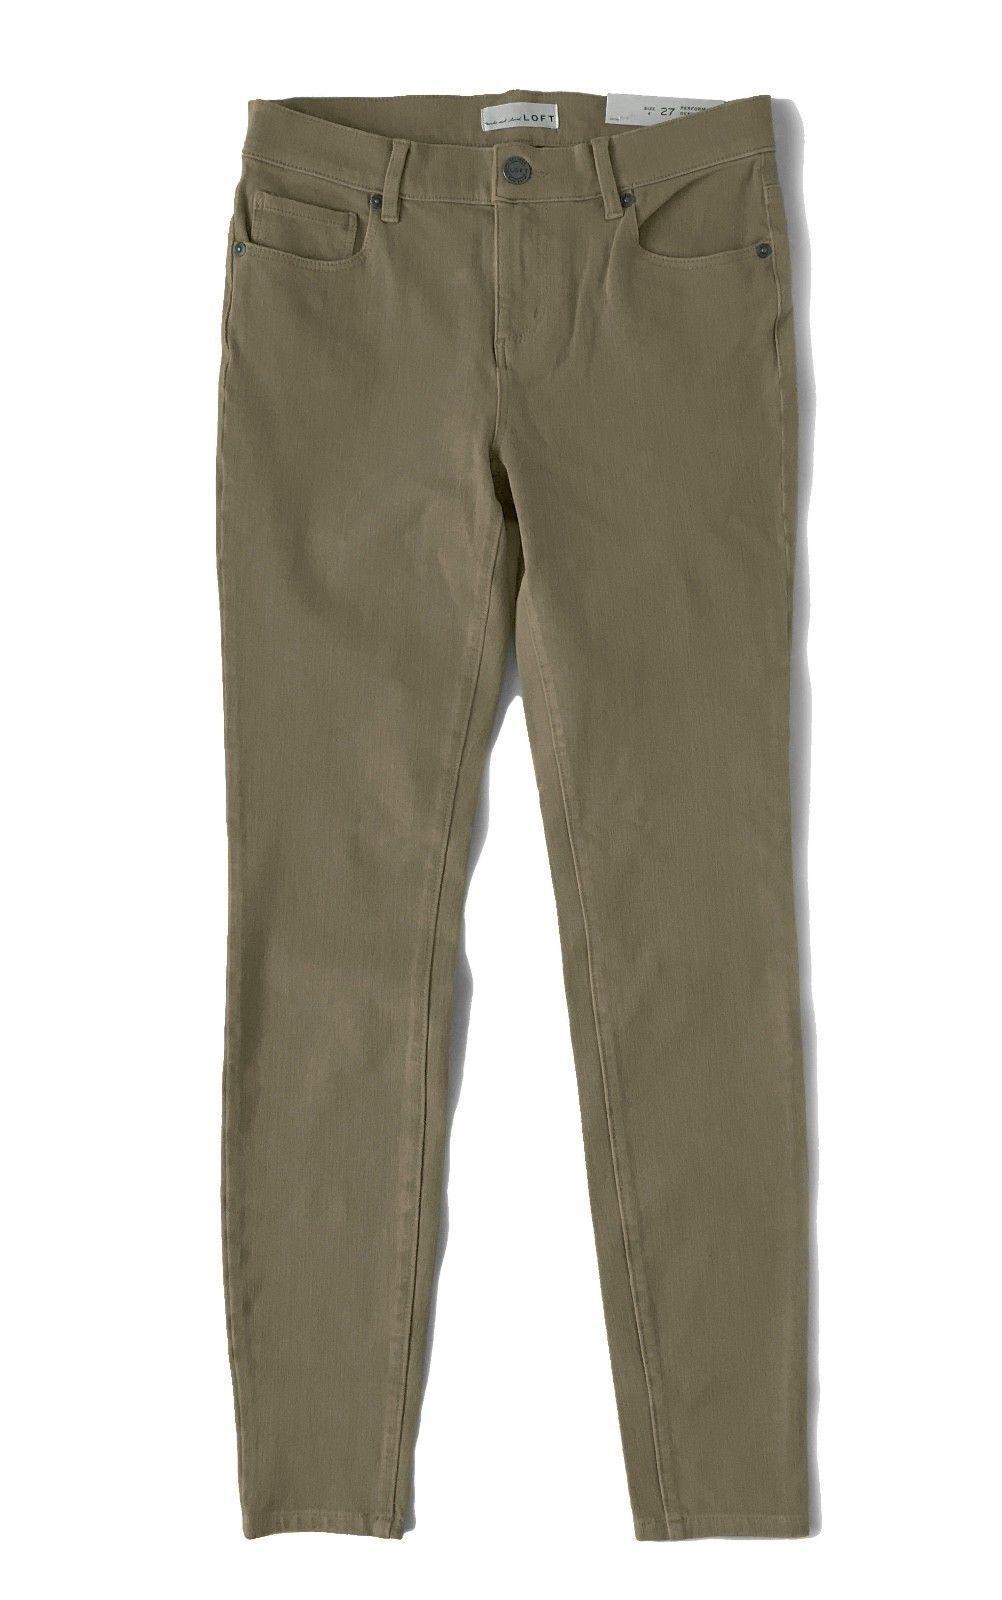 LOFT - Womens 2 (XS) 29  Olive Denim Stretch Performance Legging Jeans